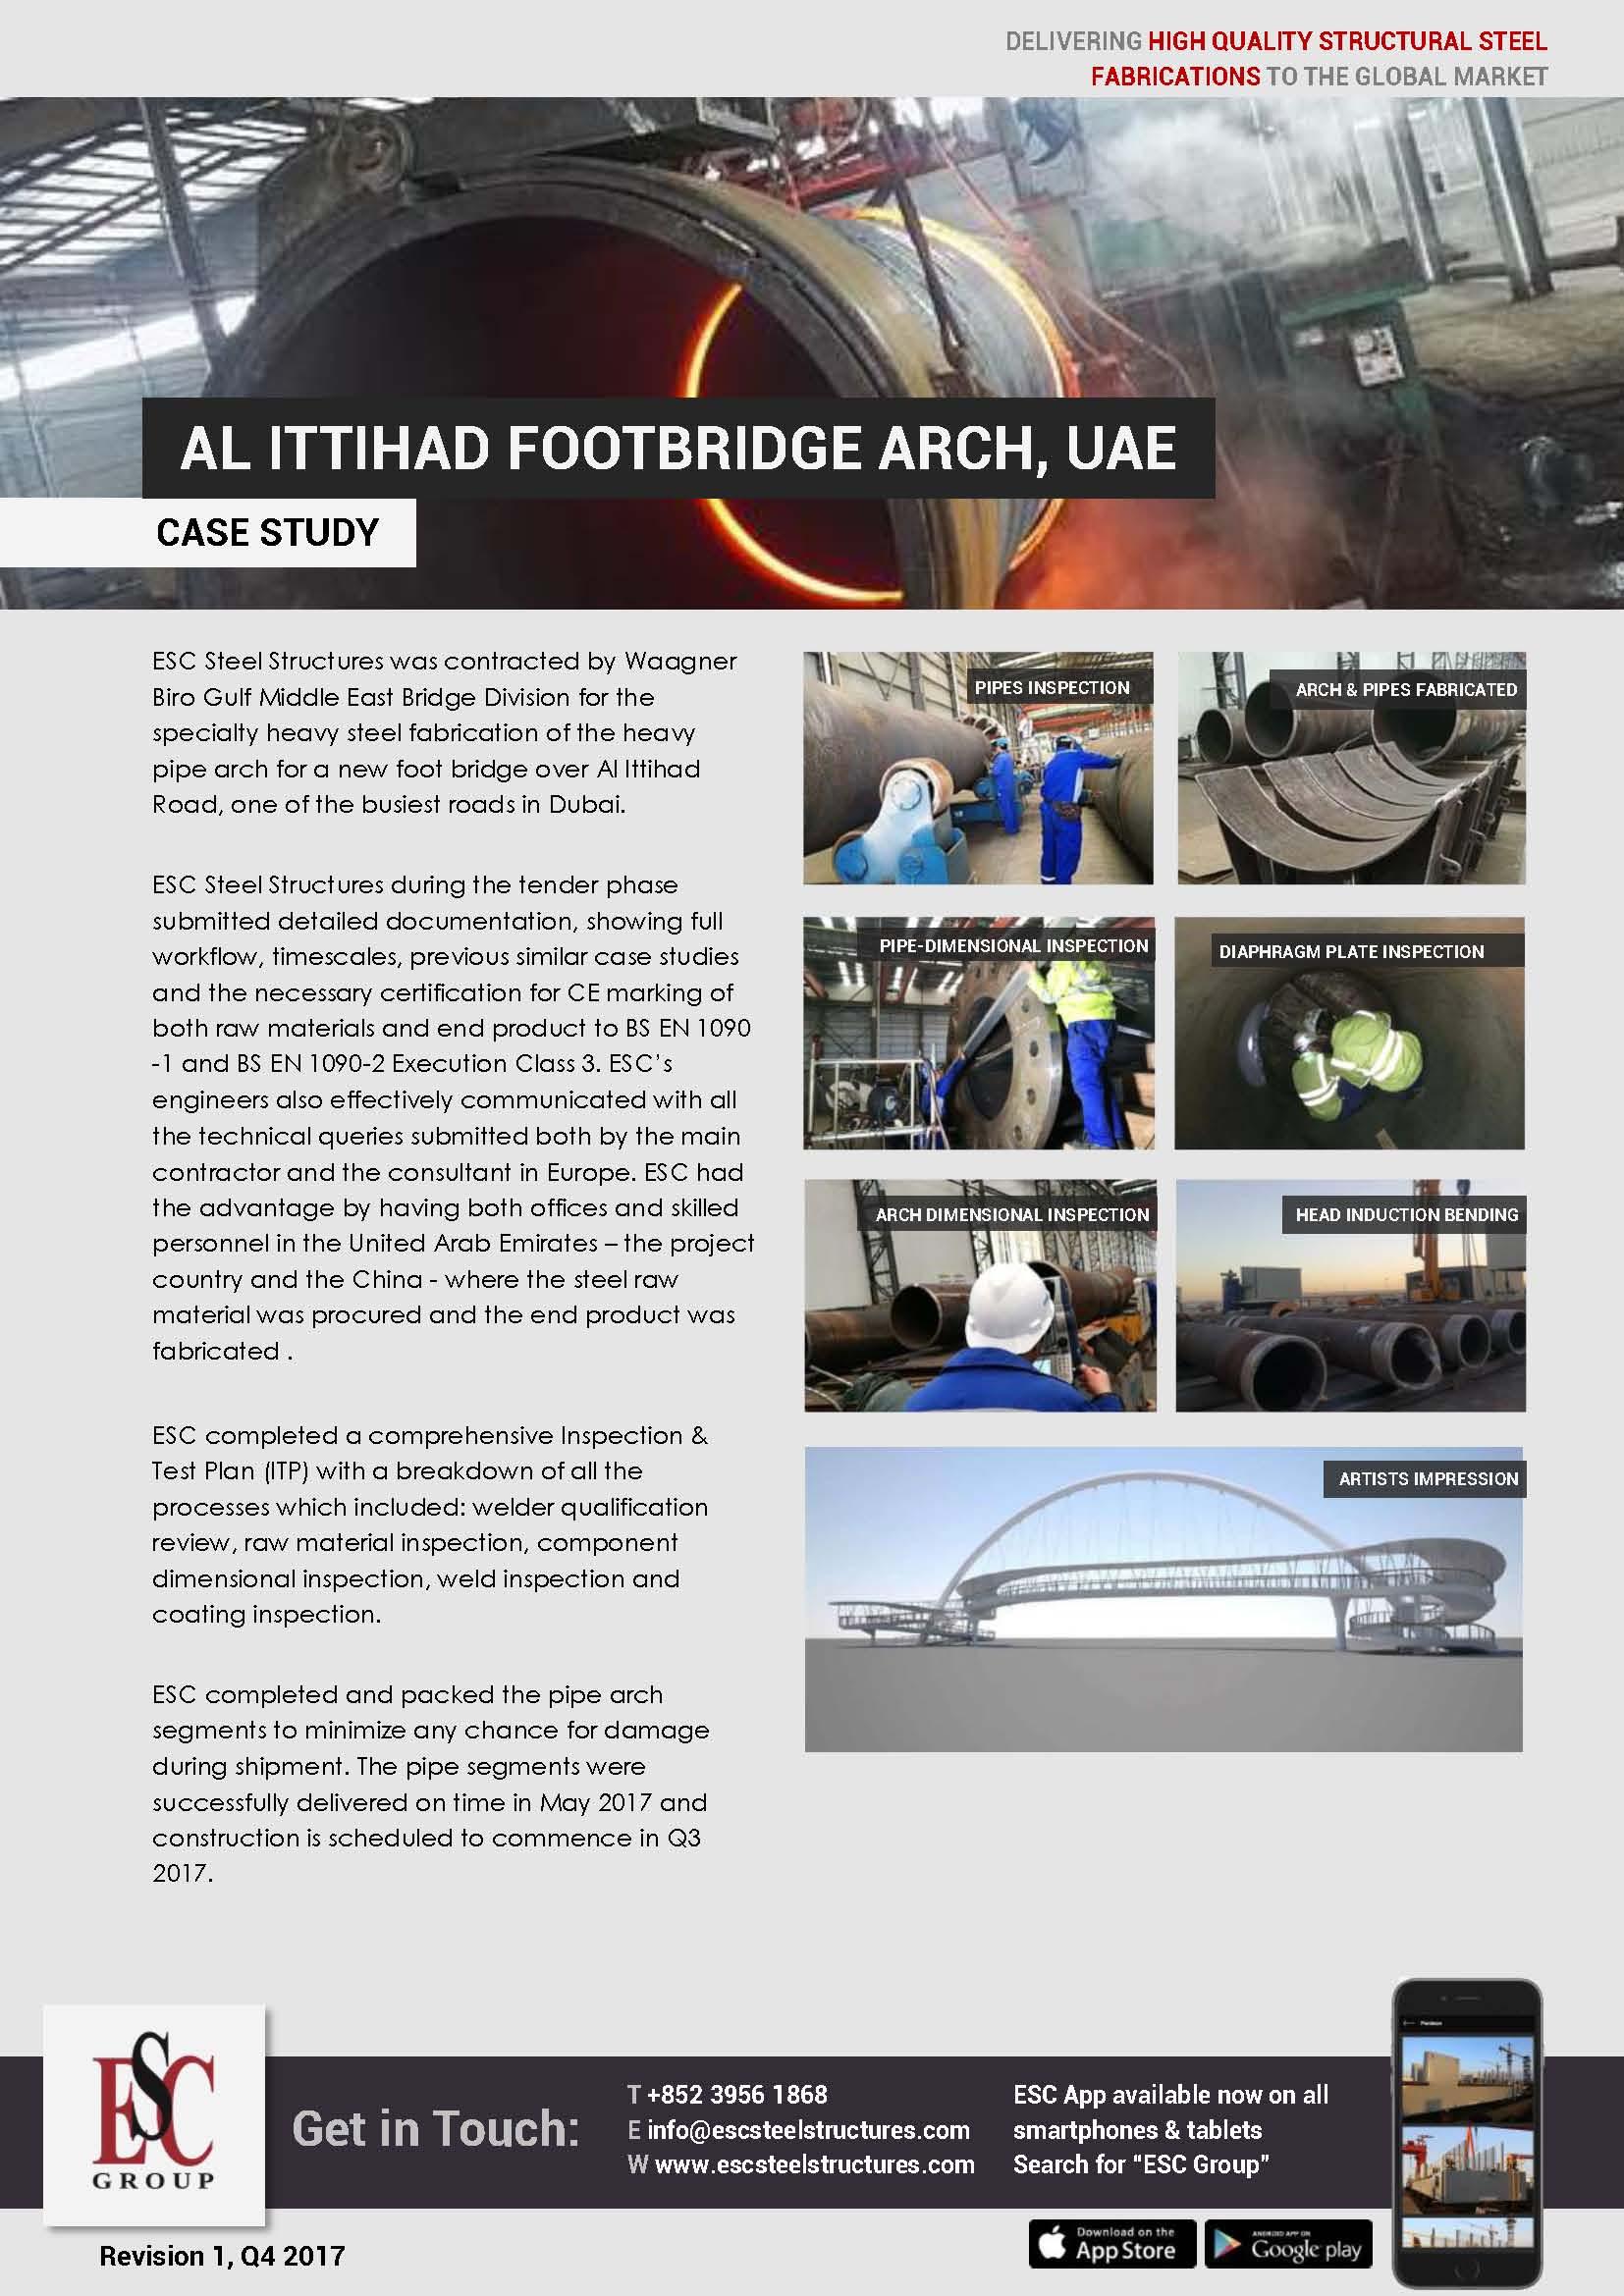 Al Ittihad Footbridge Arch